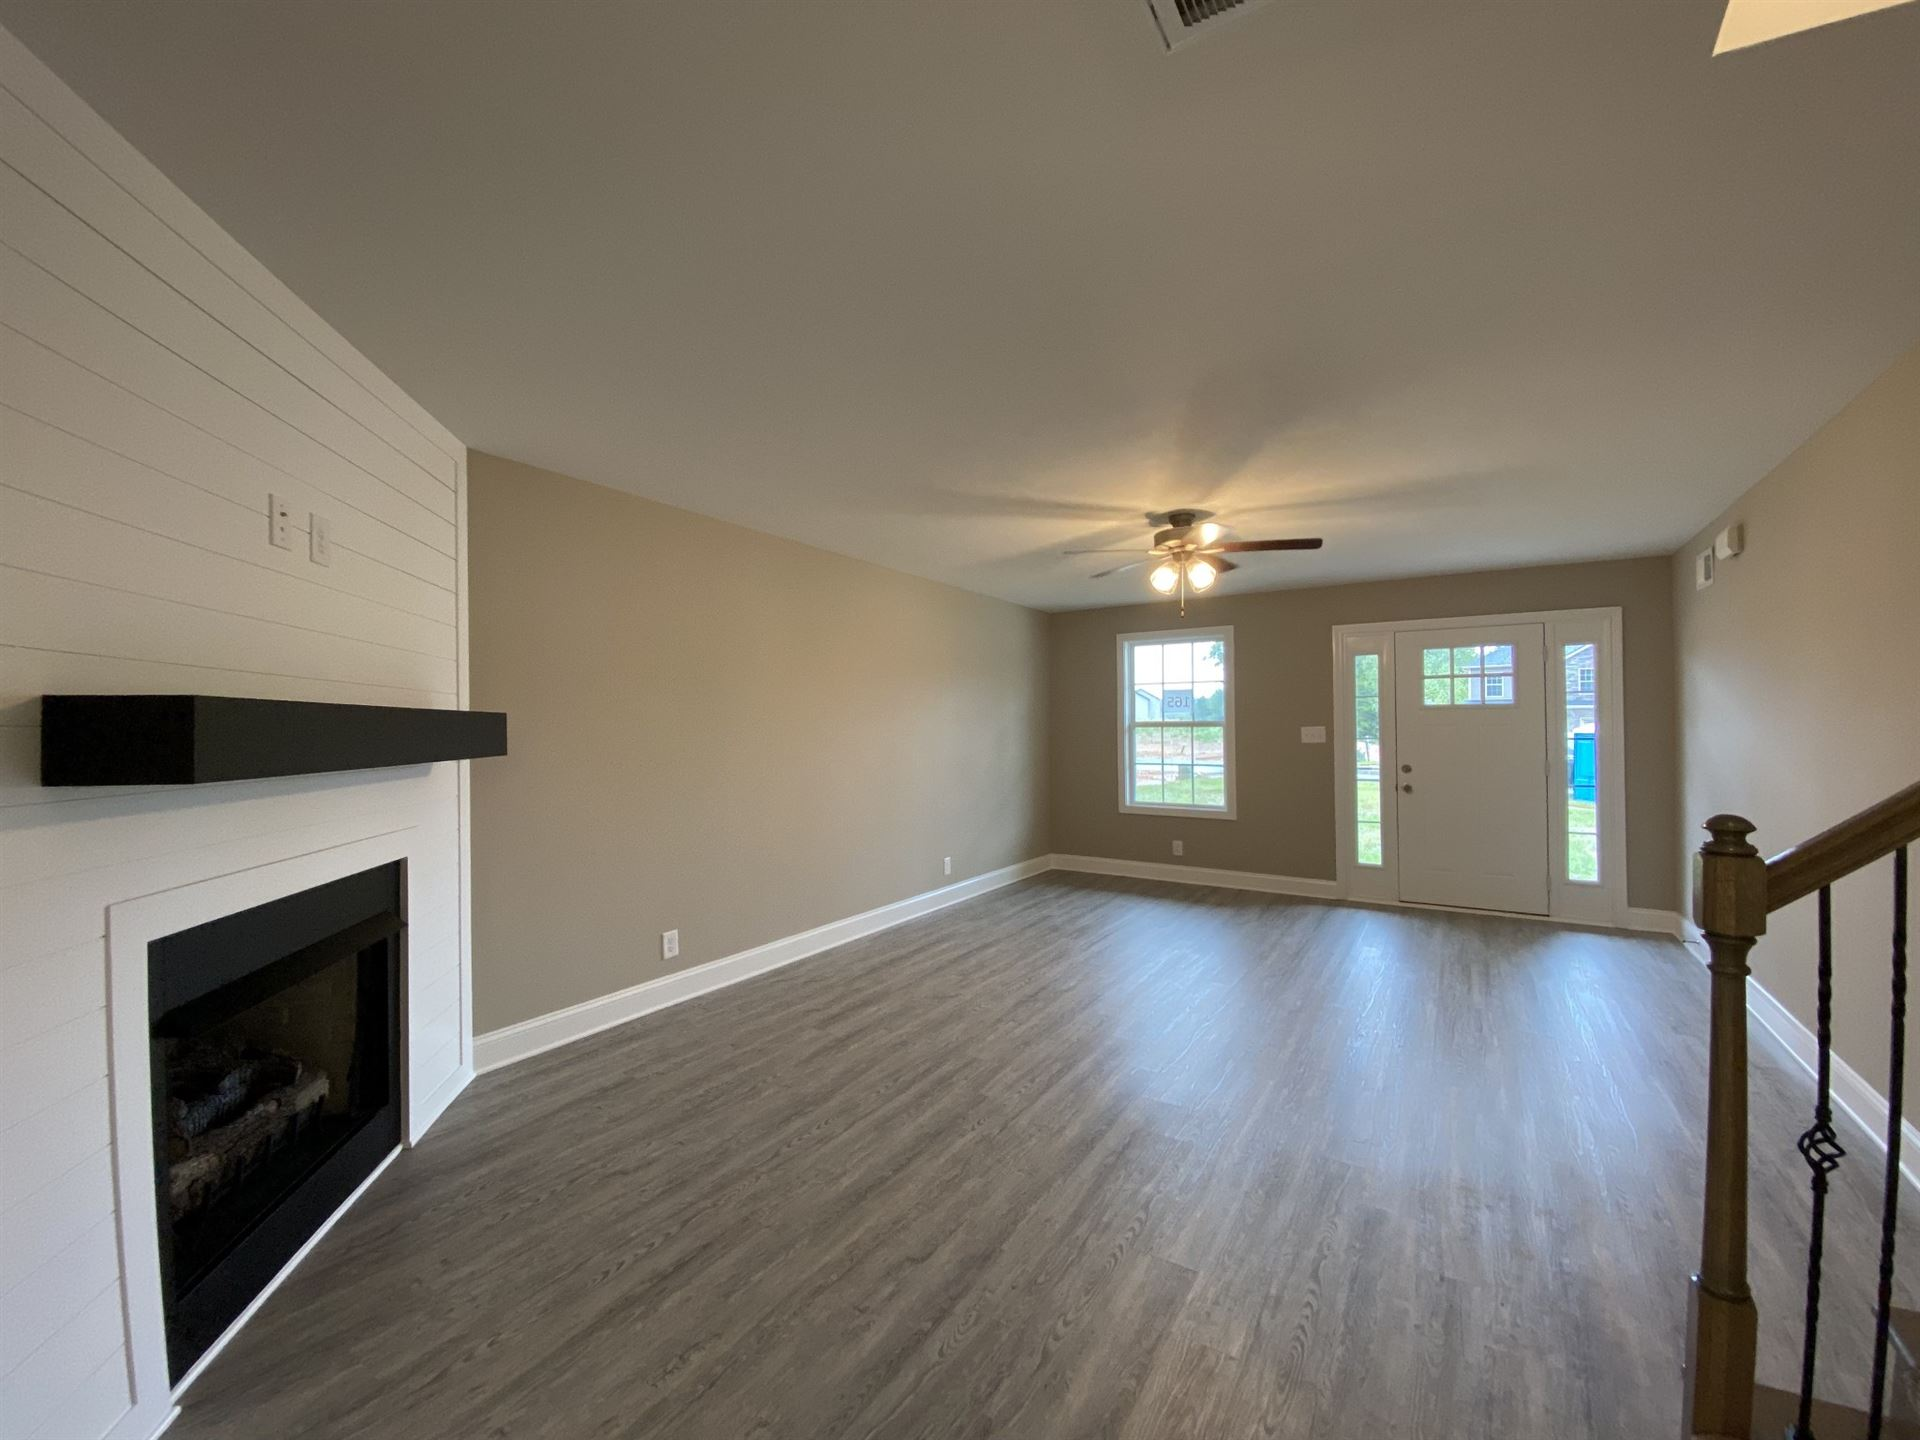 165 Glenstone, Clarksville, TN 37043 - MLS#: 2252188